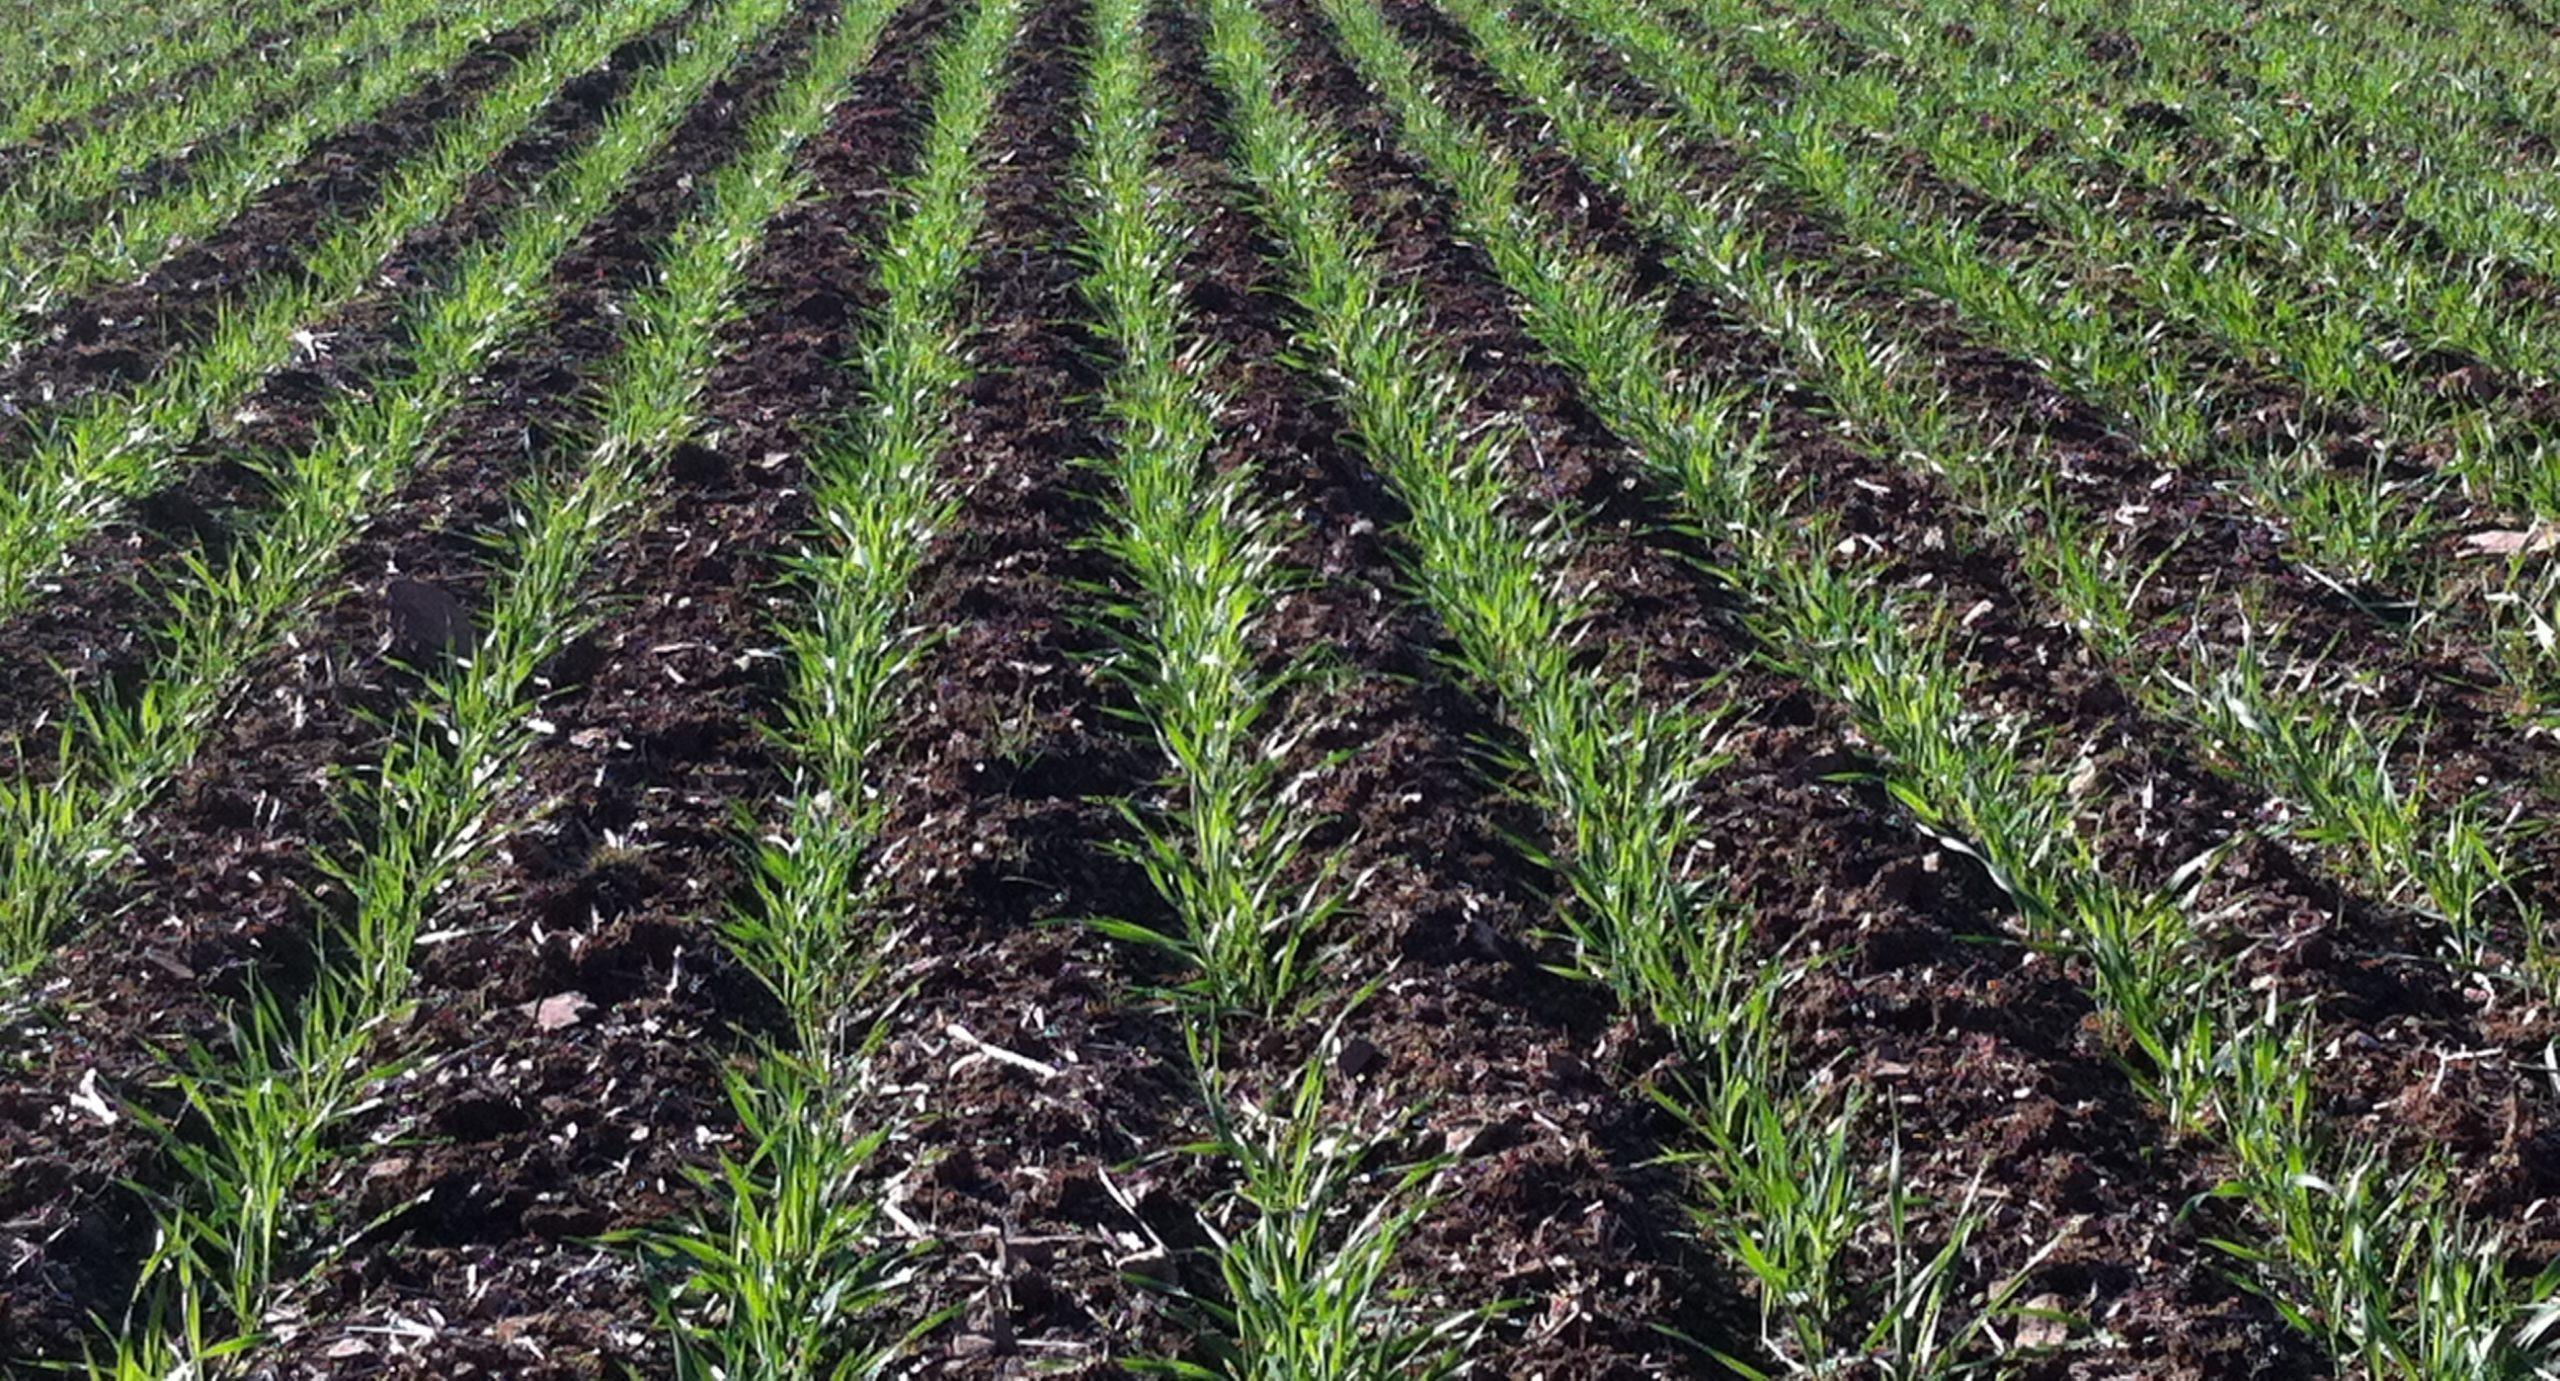 Grow a crop worth frosting